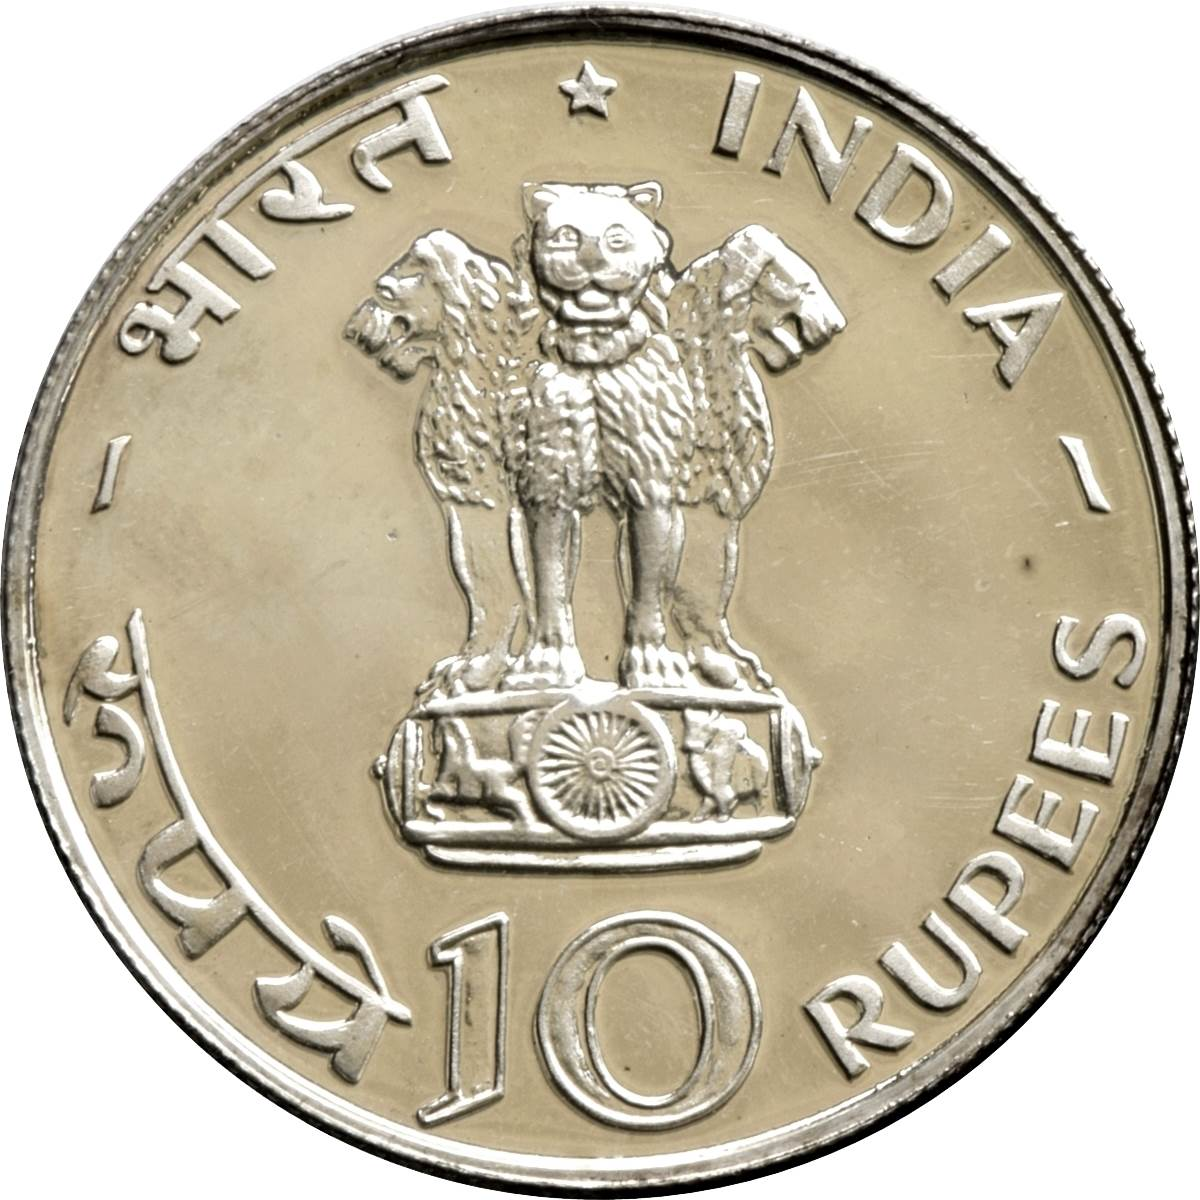 10 Rupees Fao India Numista